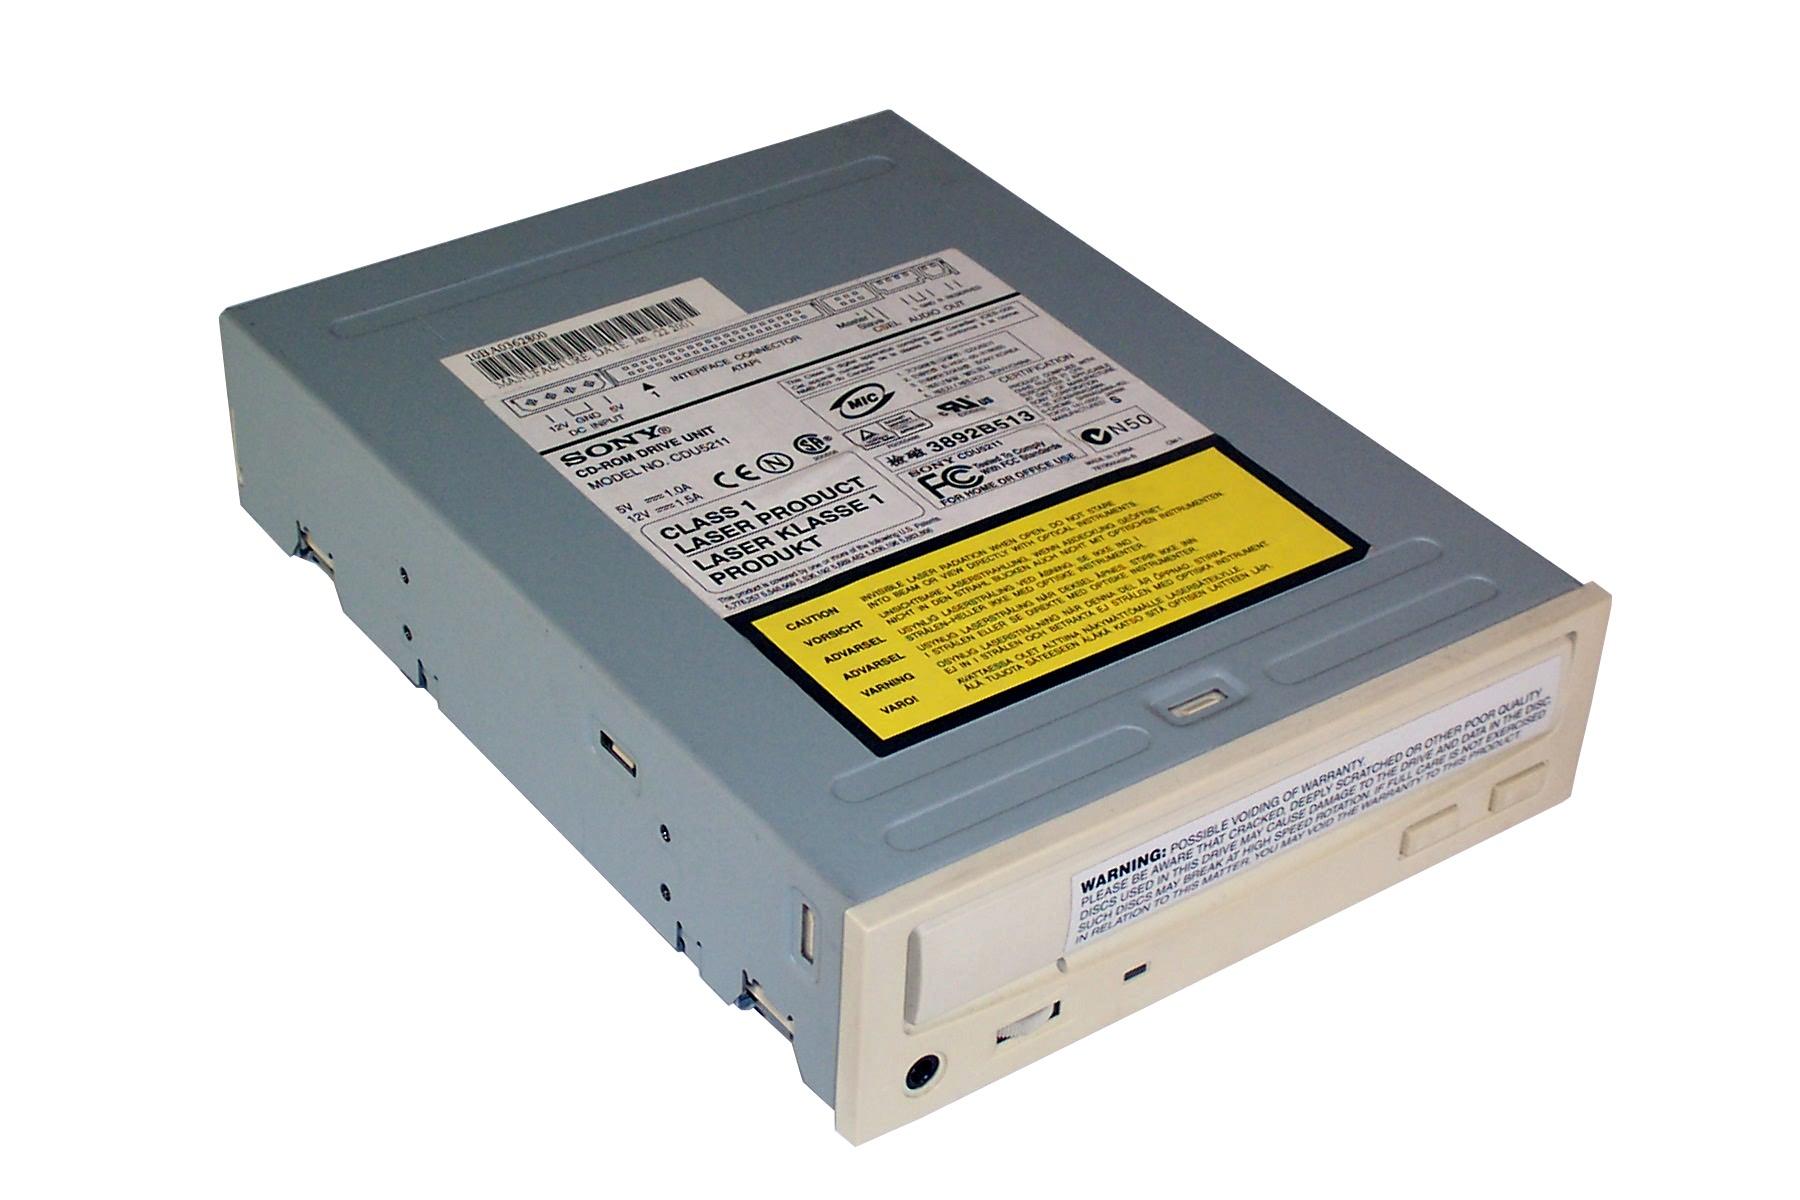 CD.DVD.ROM.Generator.2.00.SONY.rar   Save Download